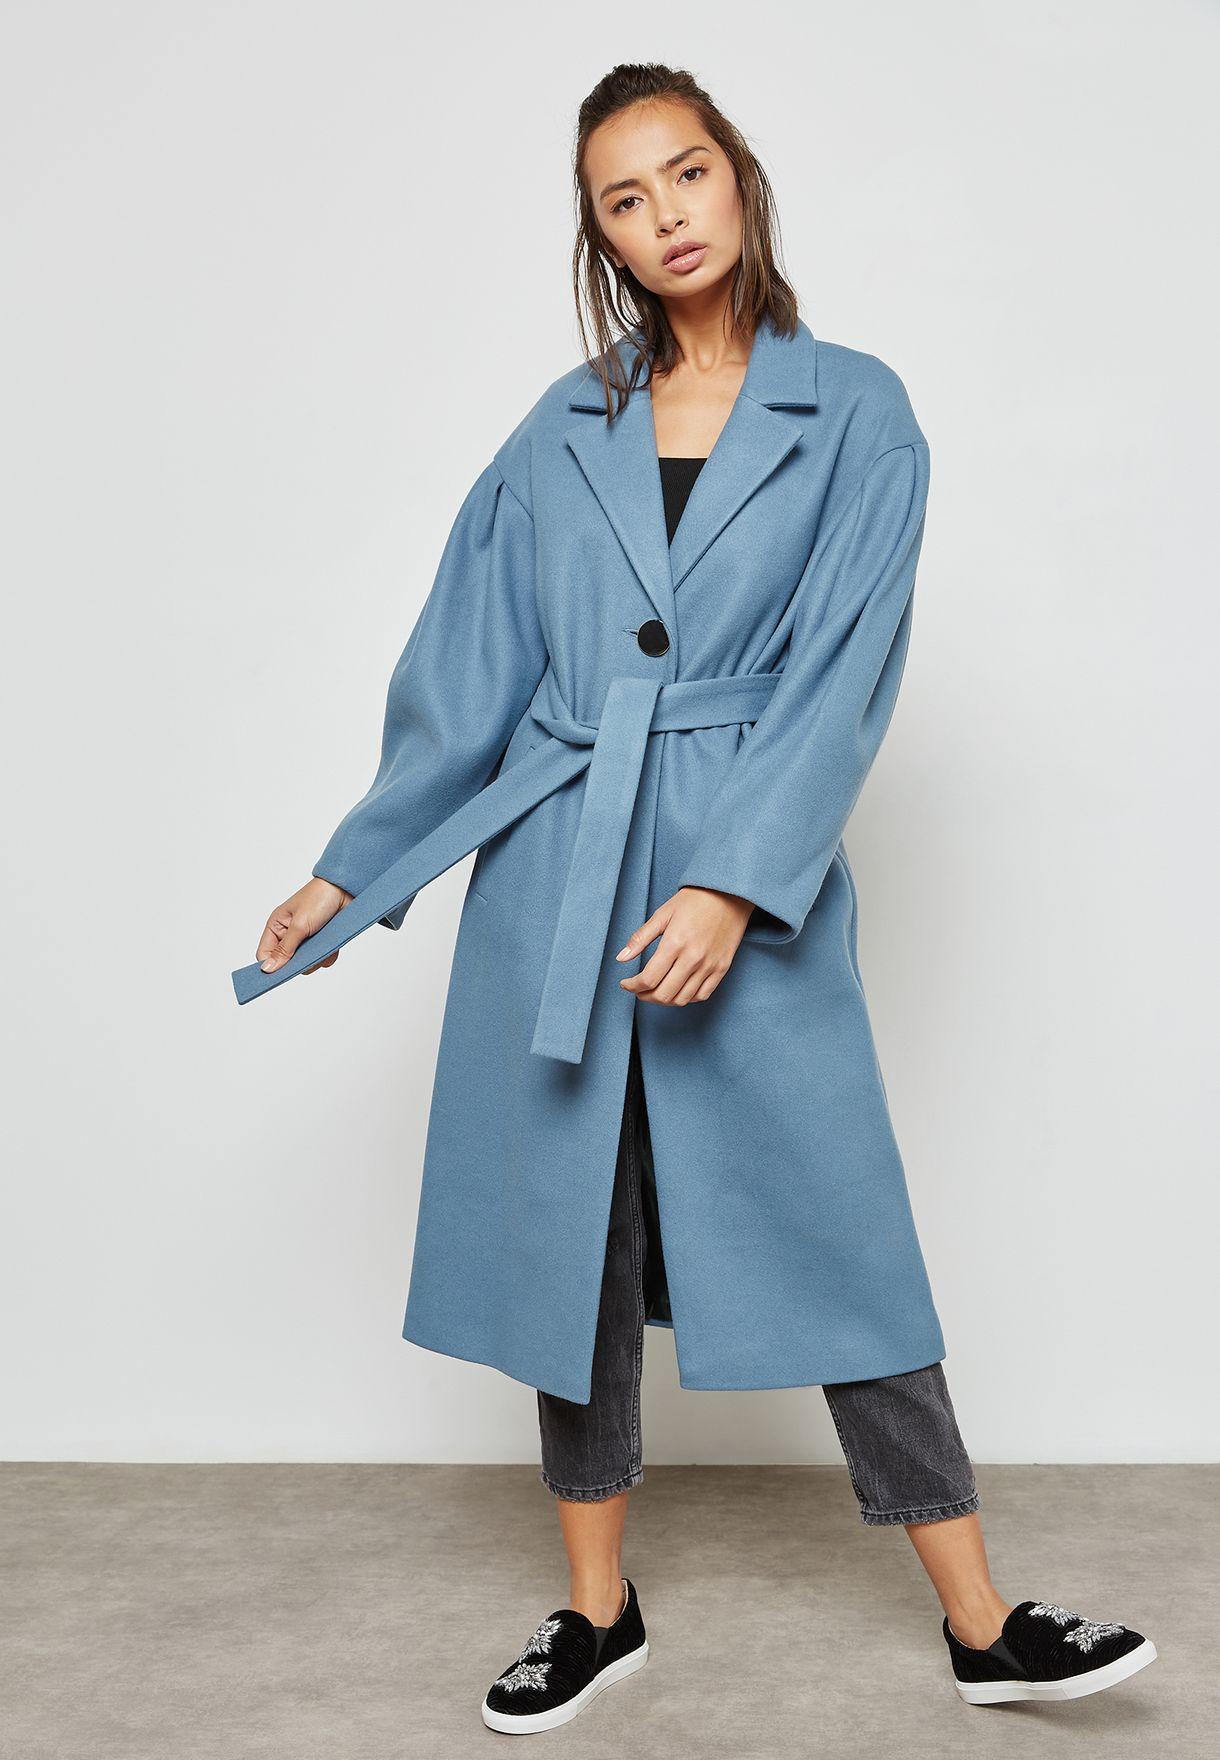 5e50c8bb9cf8 Shop Topshop blue Longline Belted Coat 07D01MBLE for Women in UAE ...